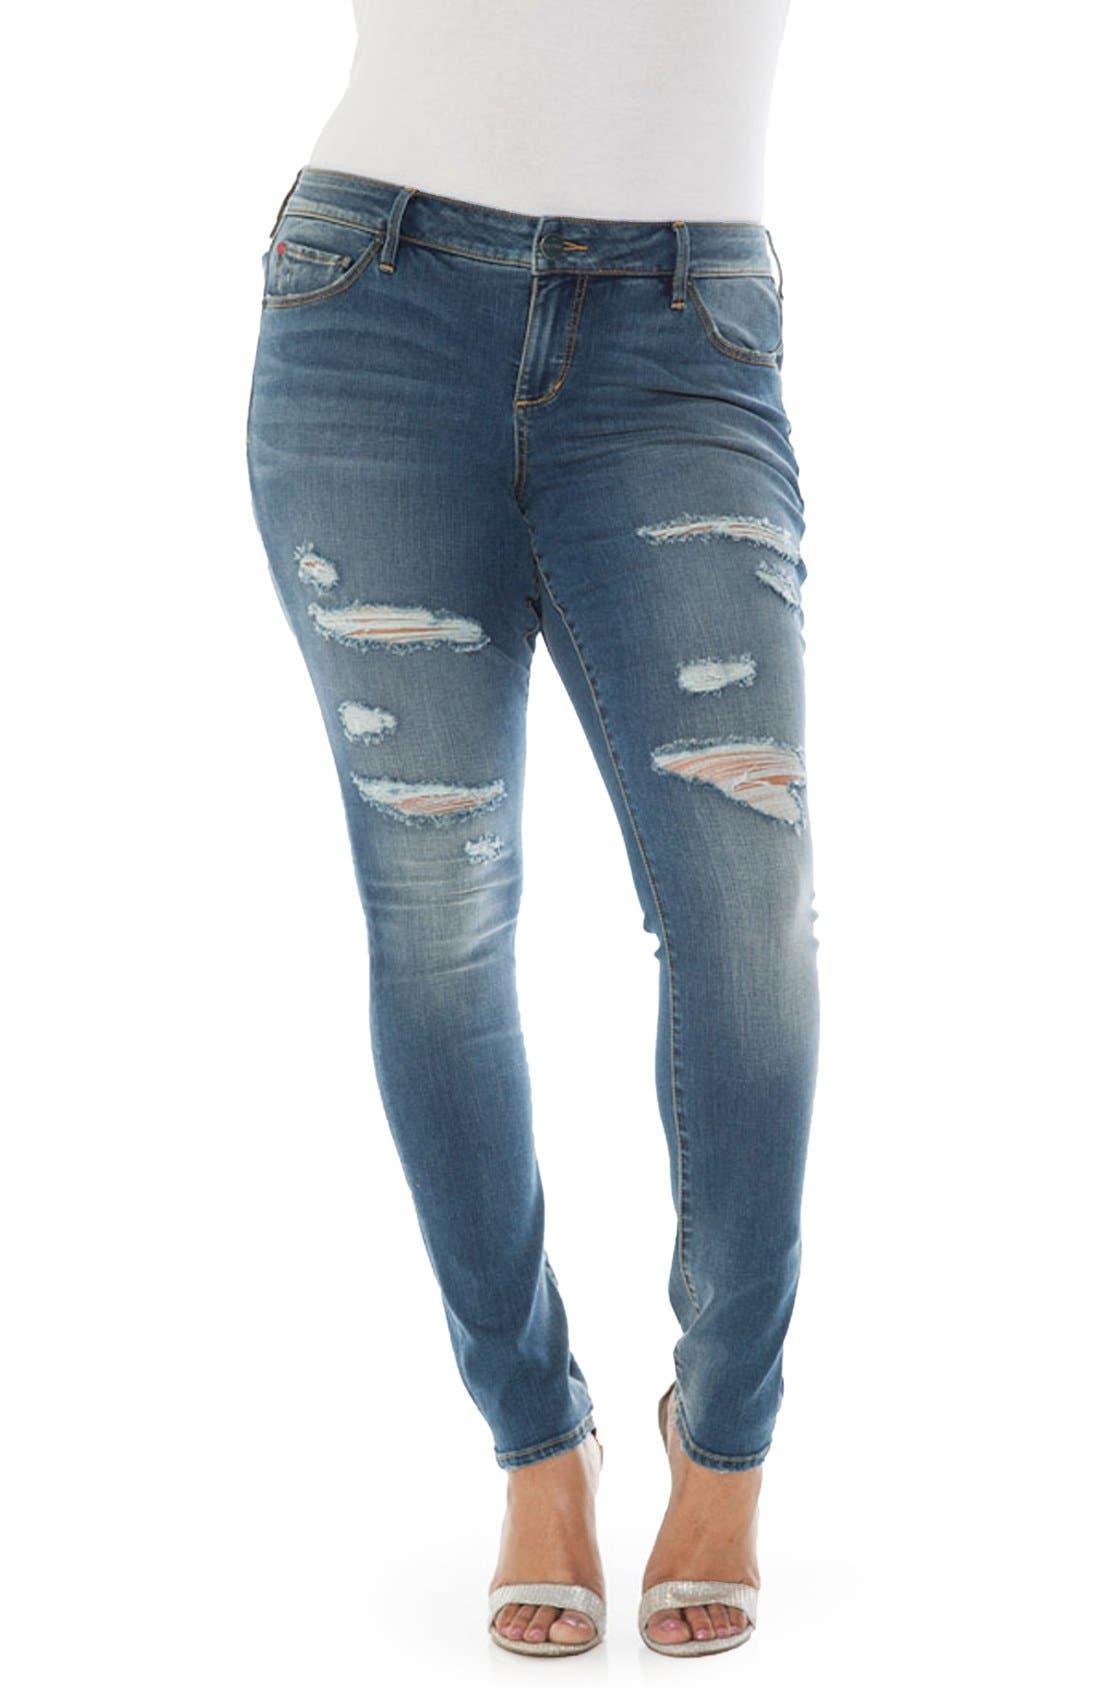 SLINK JEANS Ripped Stretch Skinny Jeans